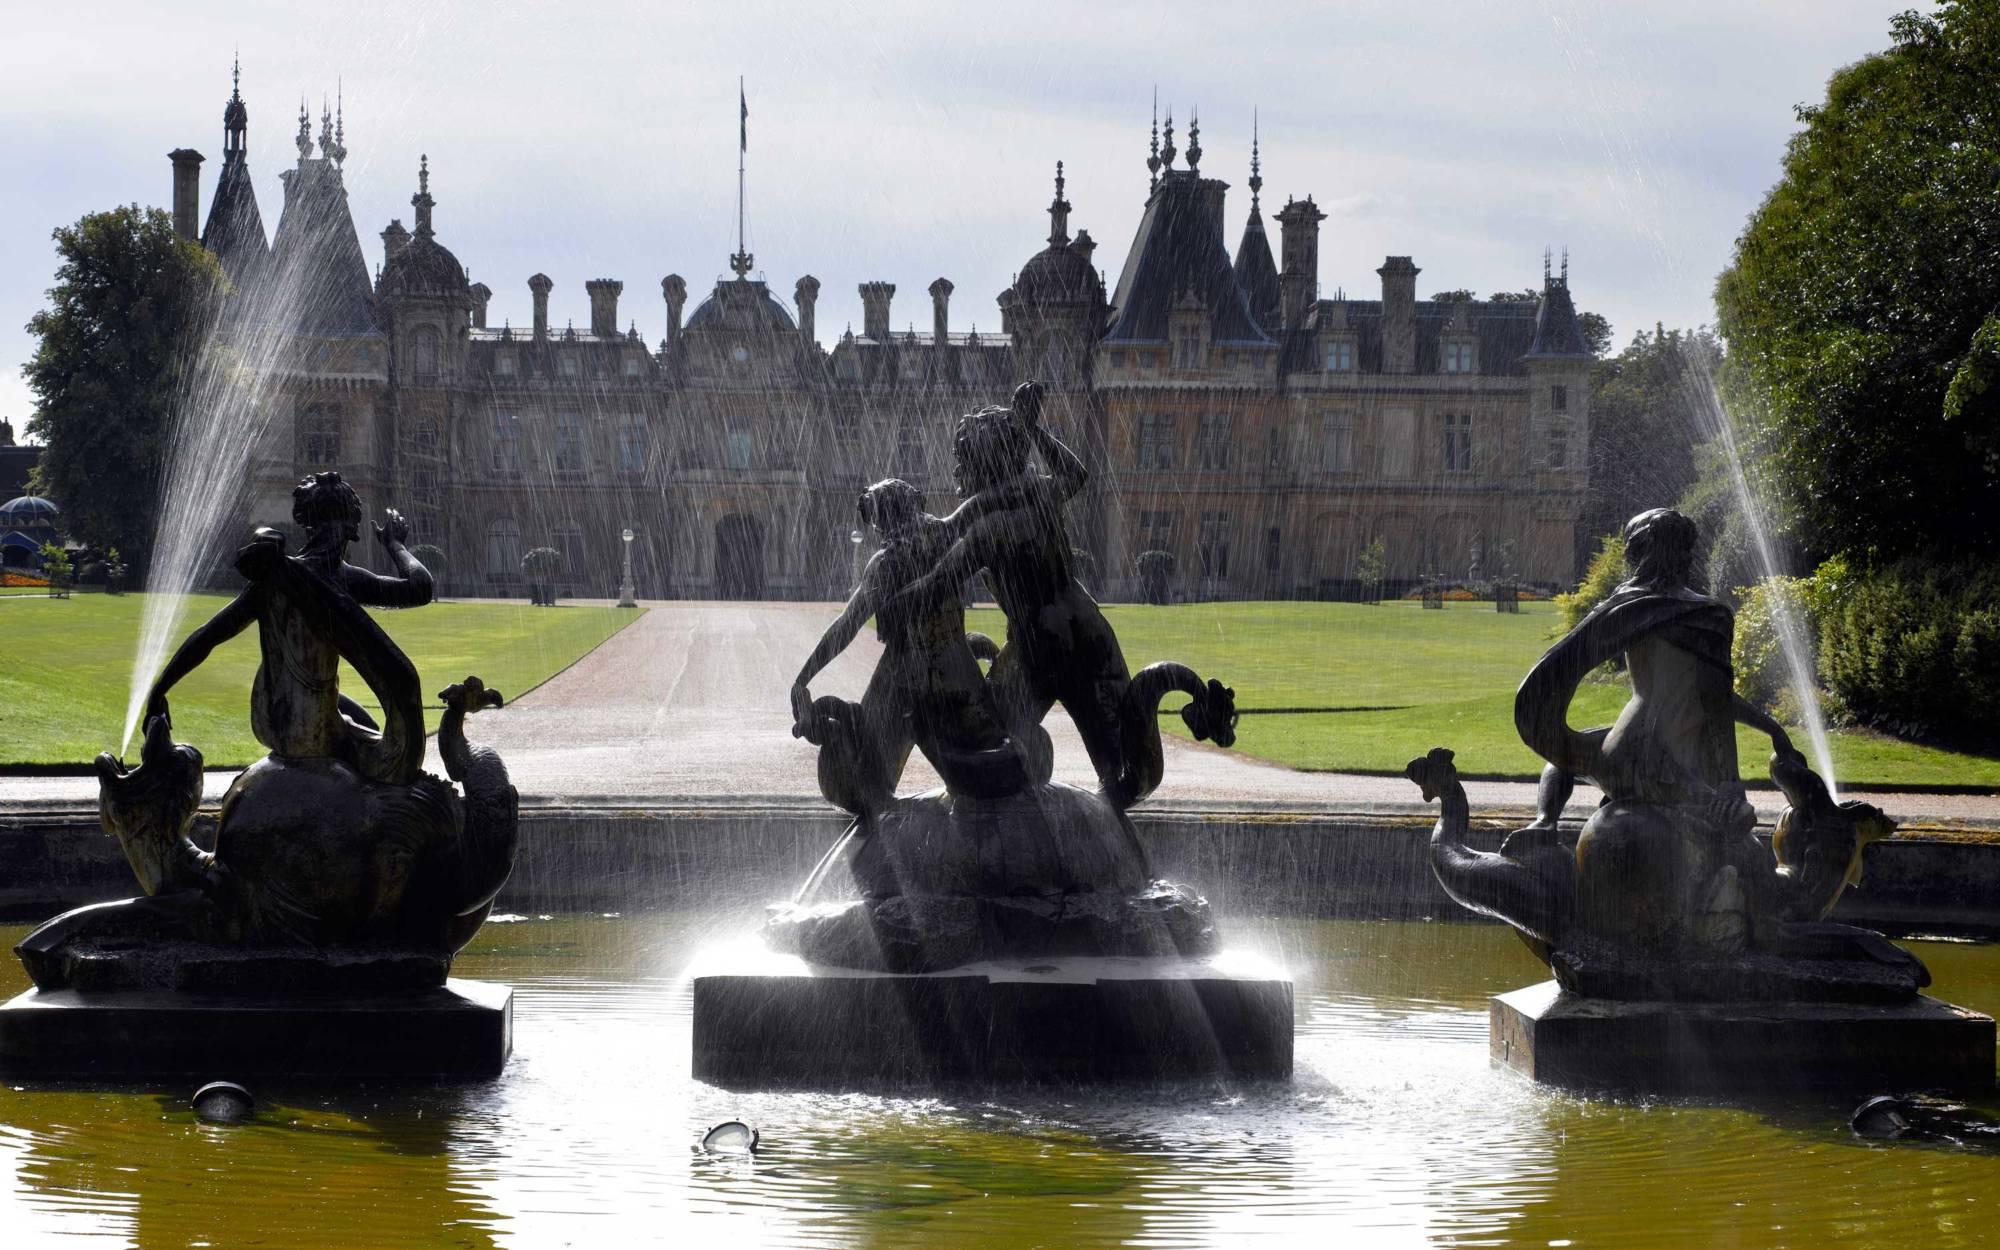 North Fountain, Waddesdon Manor